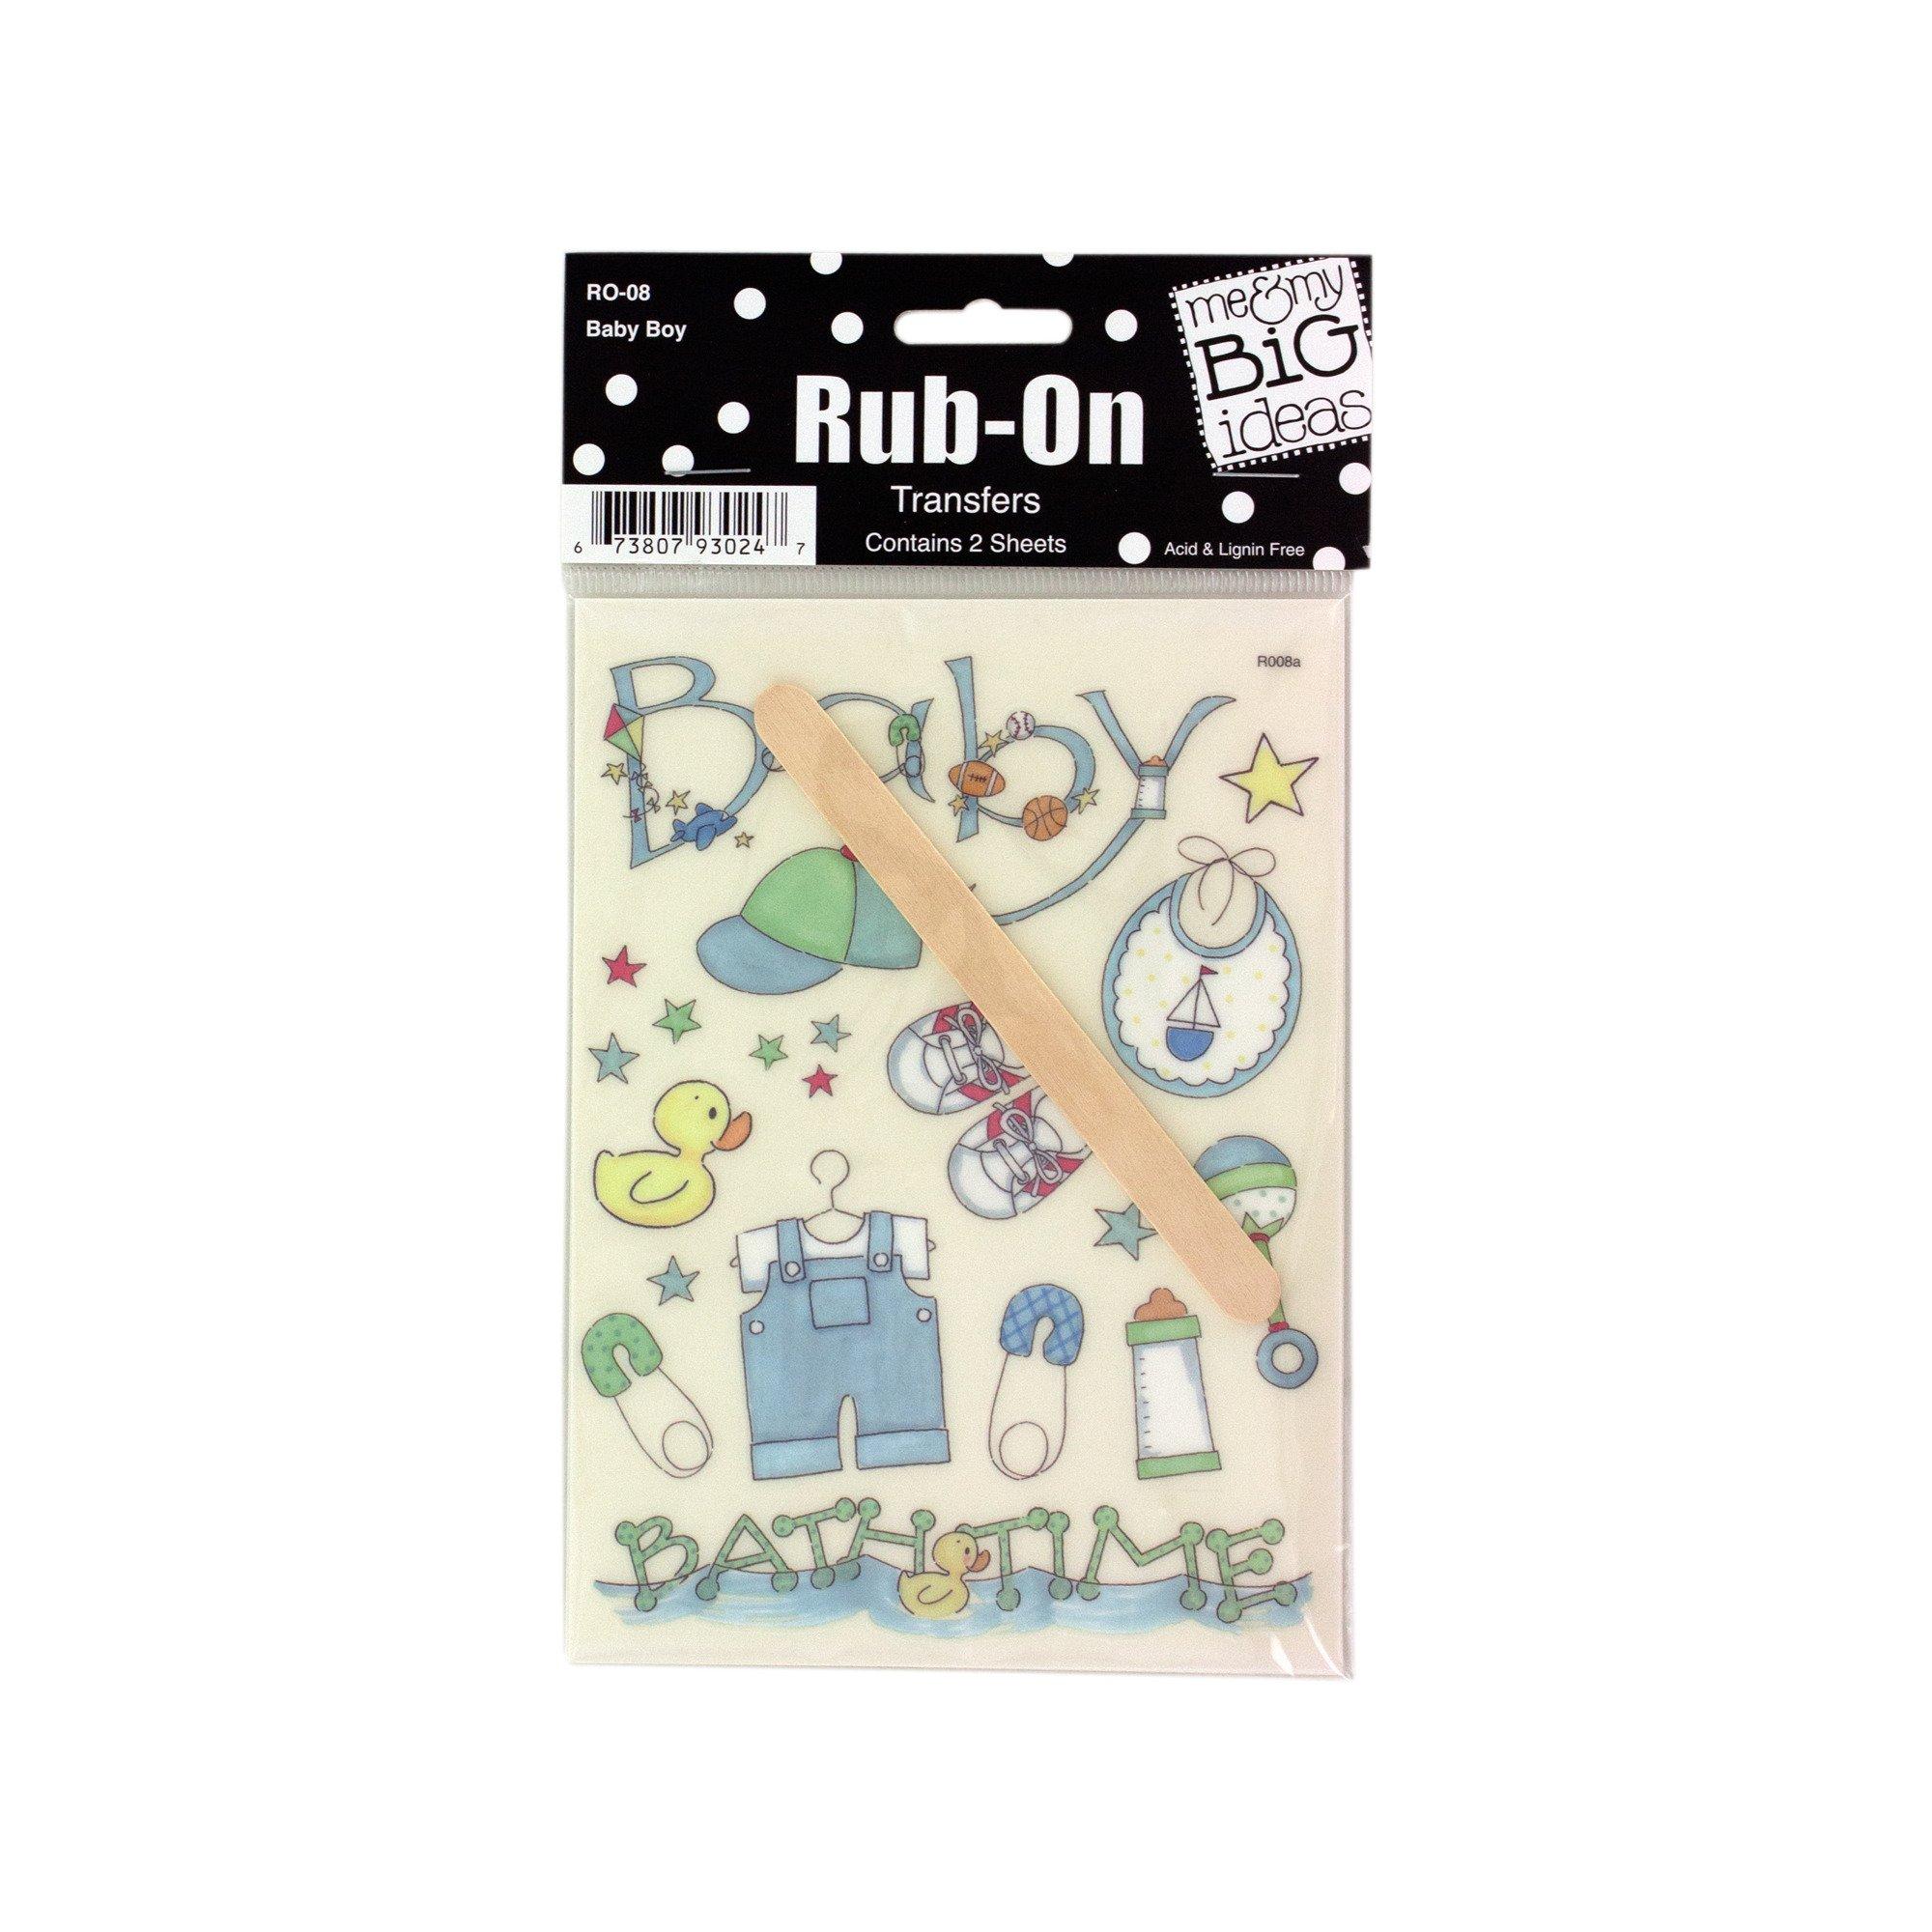 123-Wholesale - Set of 48 Baby Boy Designs Rub-On Transfers - Scrapbooking Rub-ons